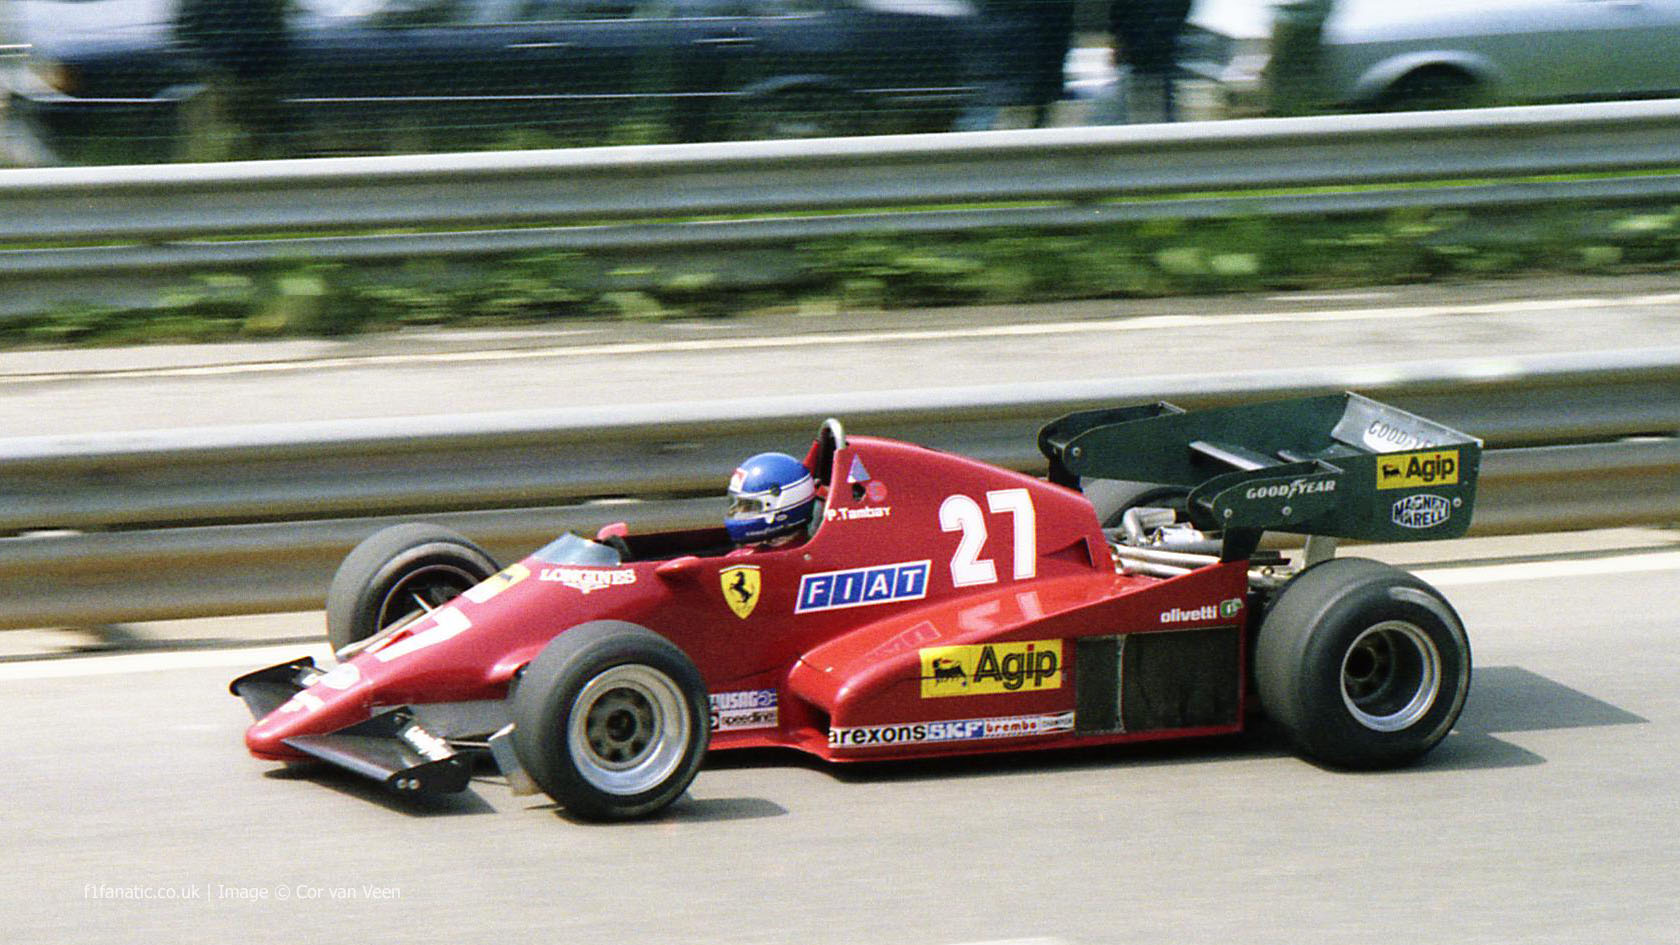 Patrick Tambay, Ferrari, Spa-Francorchamps, 1983